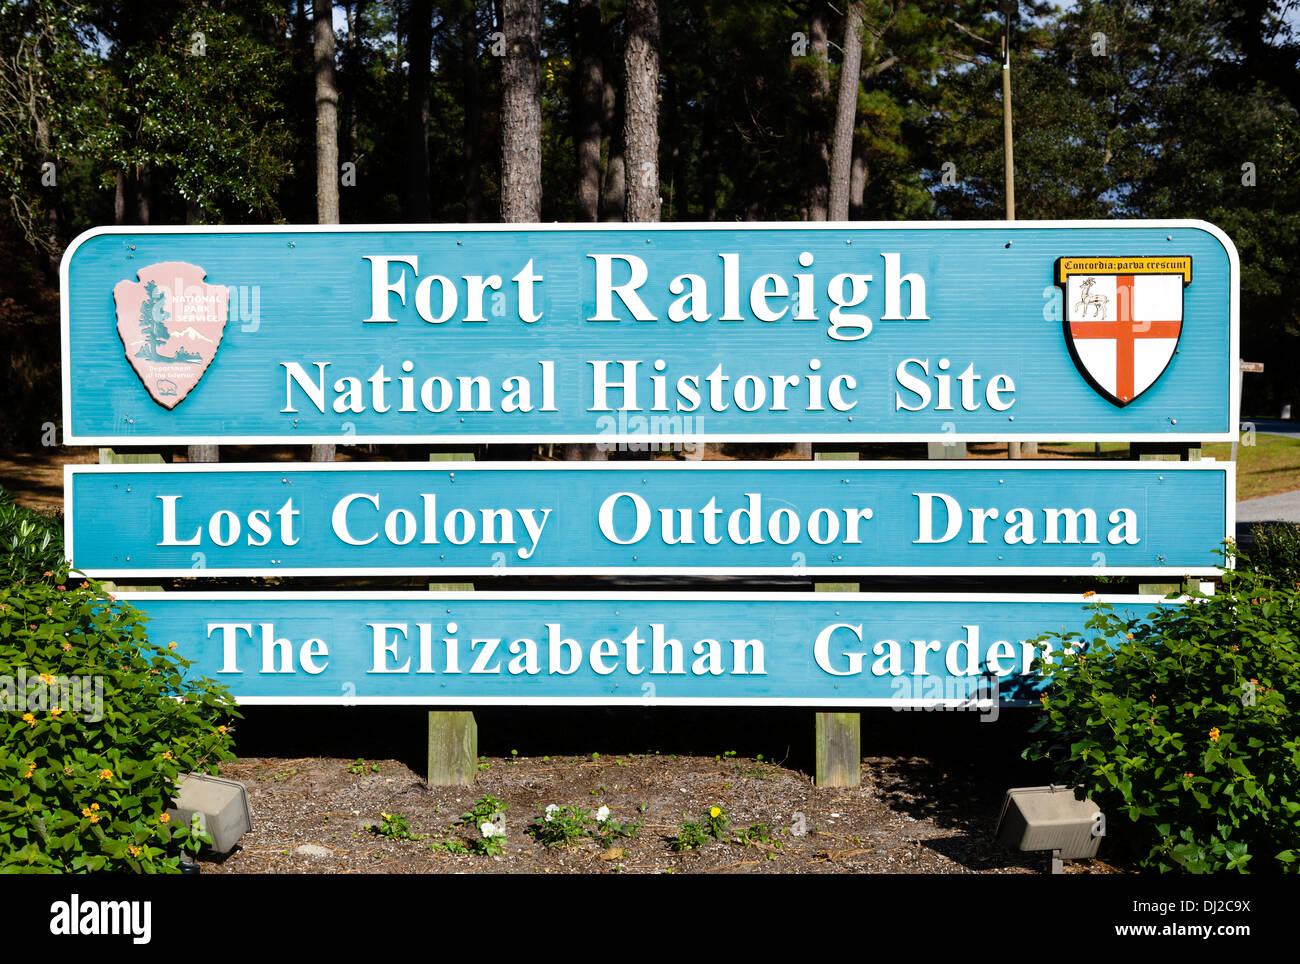 Entrance sign to Fort Raleigh National Historic Site, Roanoke Island, North Carolina, USA - Stock Image